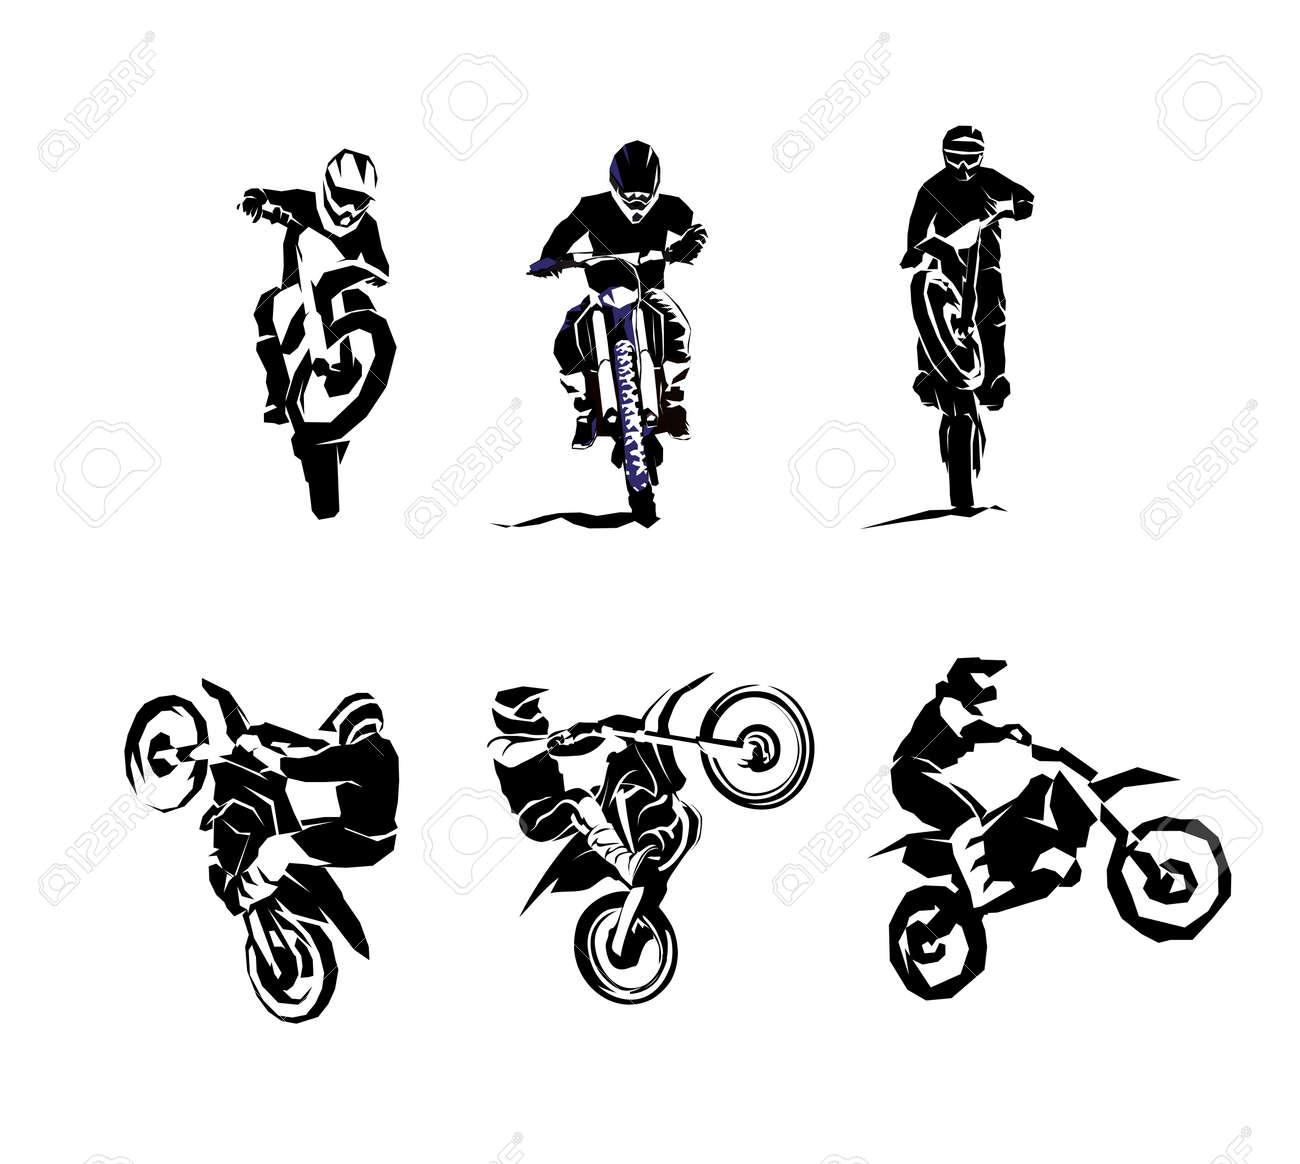 Extreme Motorbike Big Vector Set 6etc Motocross Dirtbike Enduro Royalty Free Cliparts Vectors And Stock Illustration Image 124150167